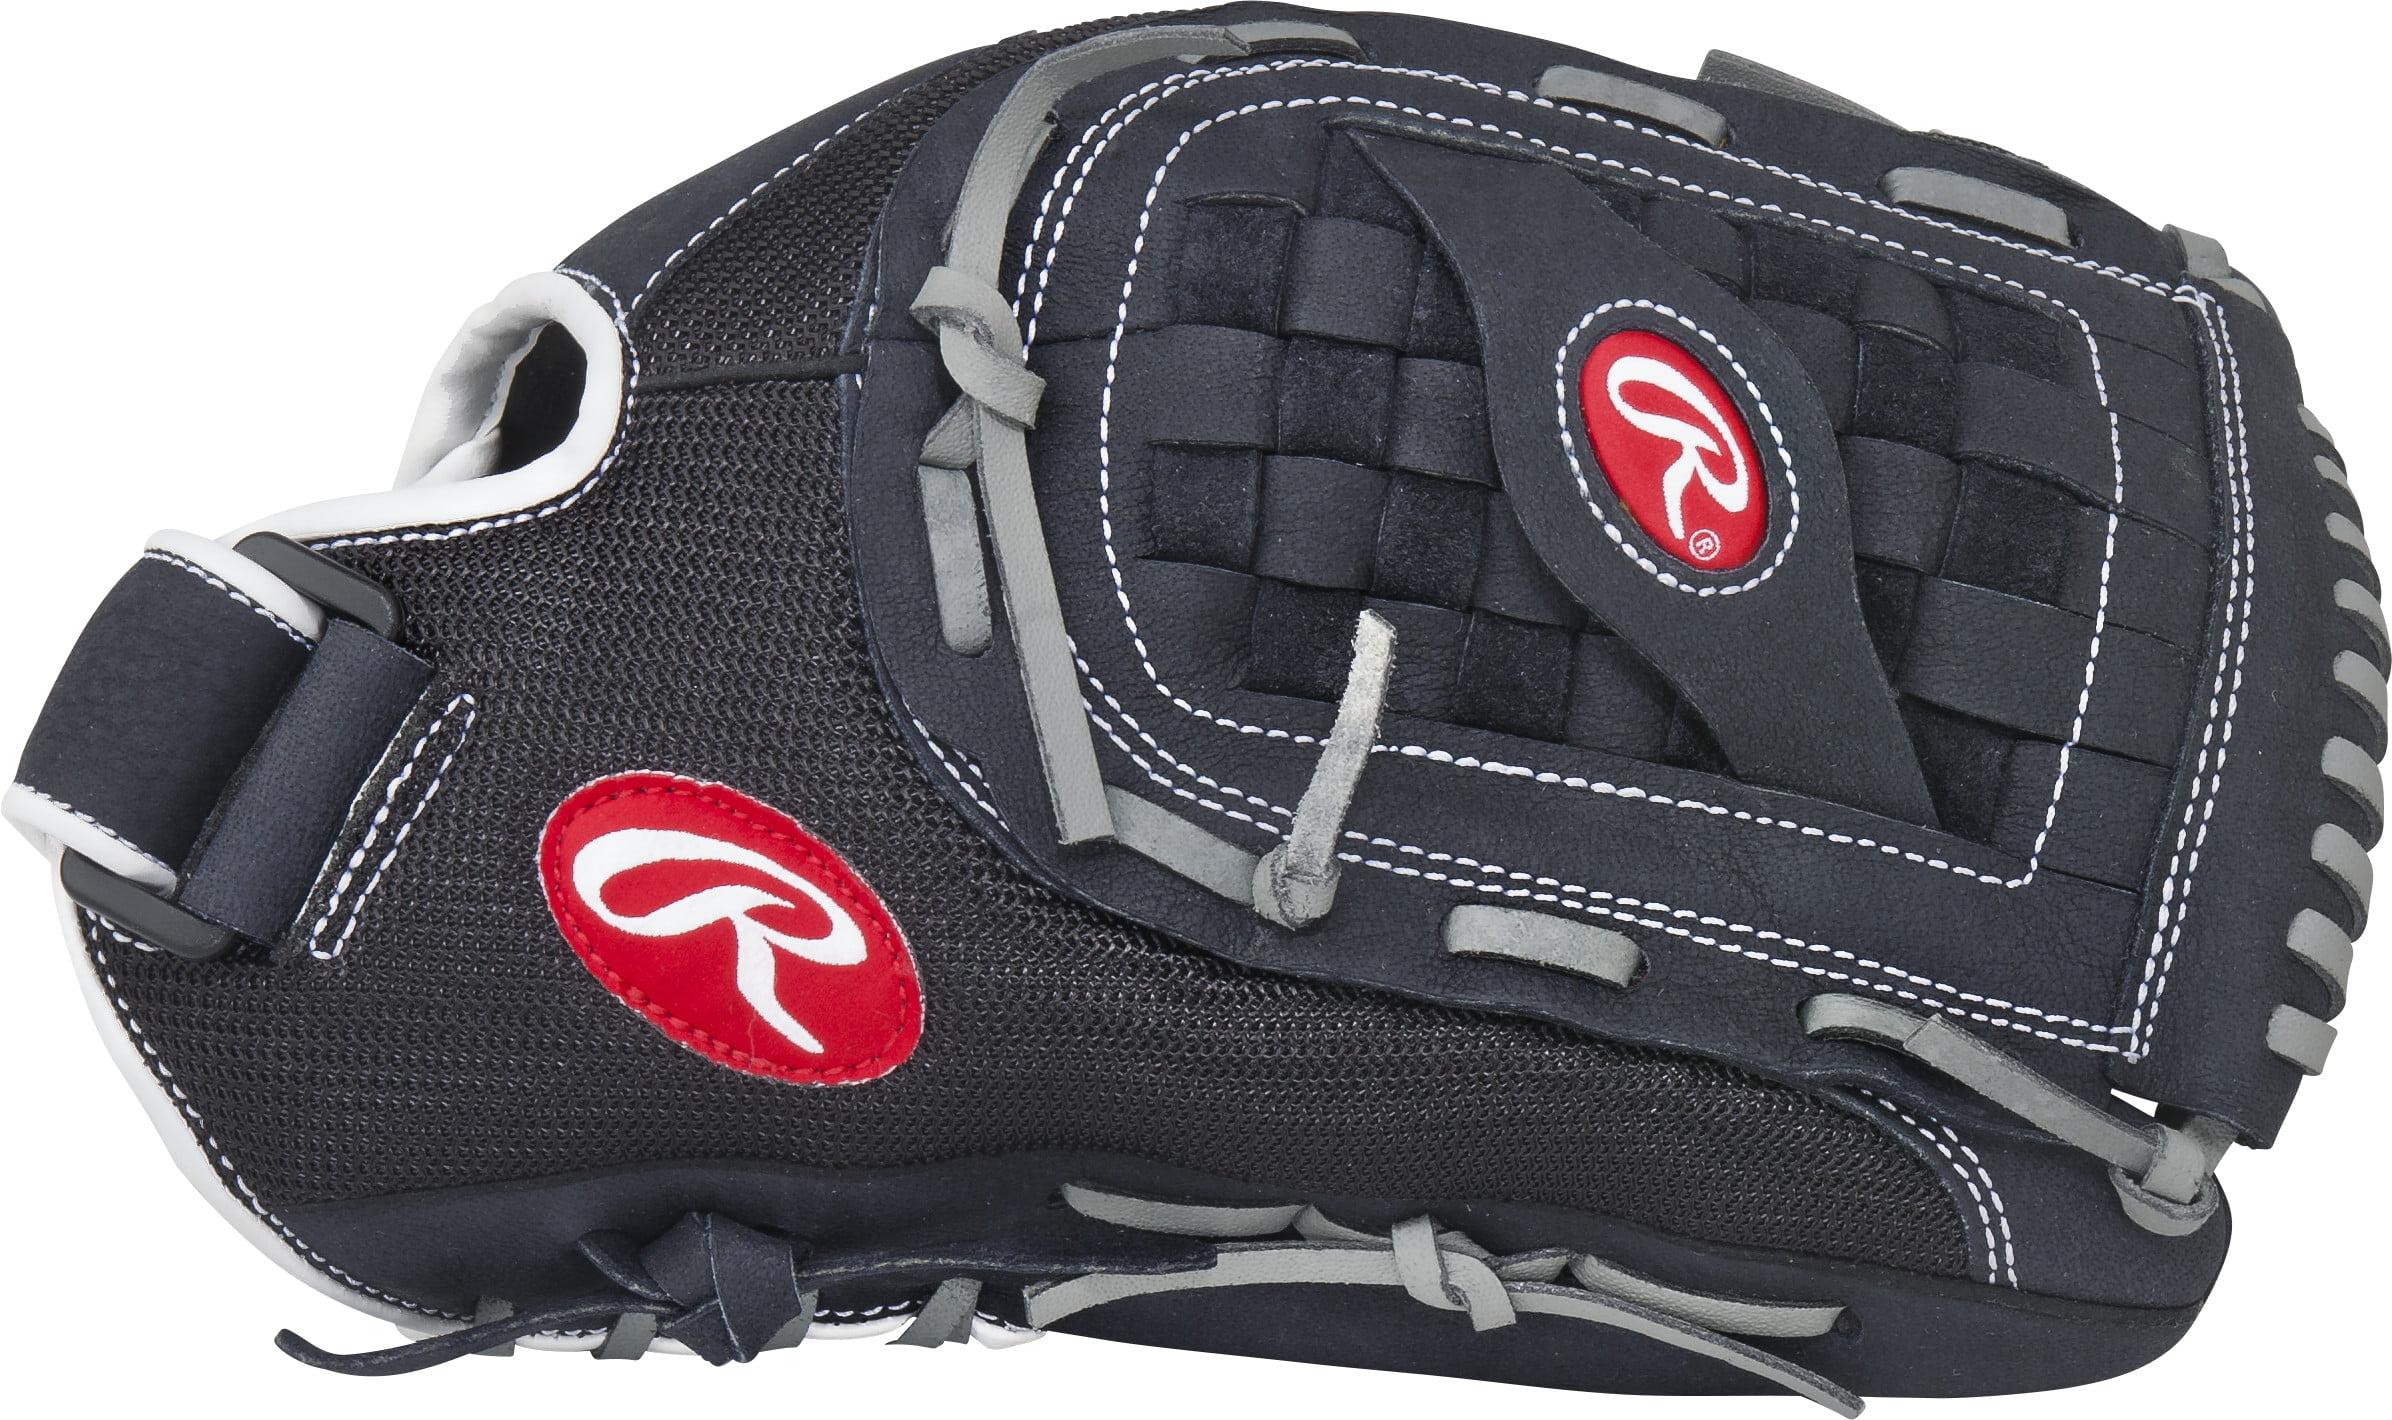 Rawlings Renegade Series Baseball Glove by Rawlings